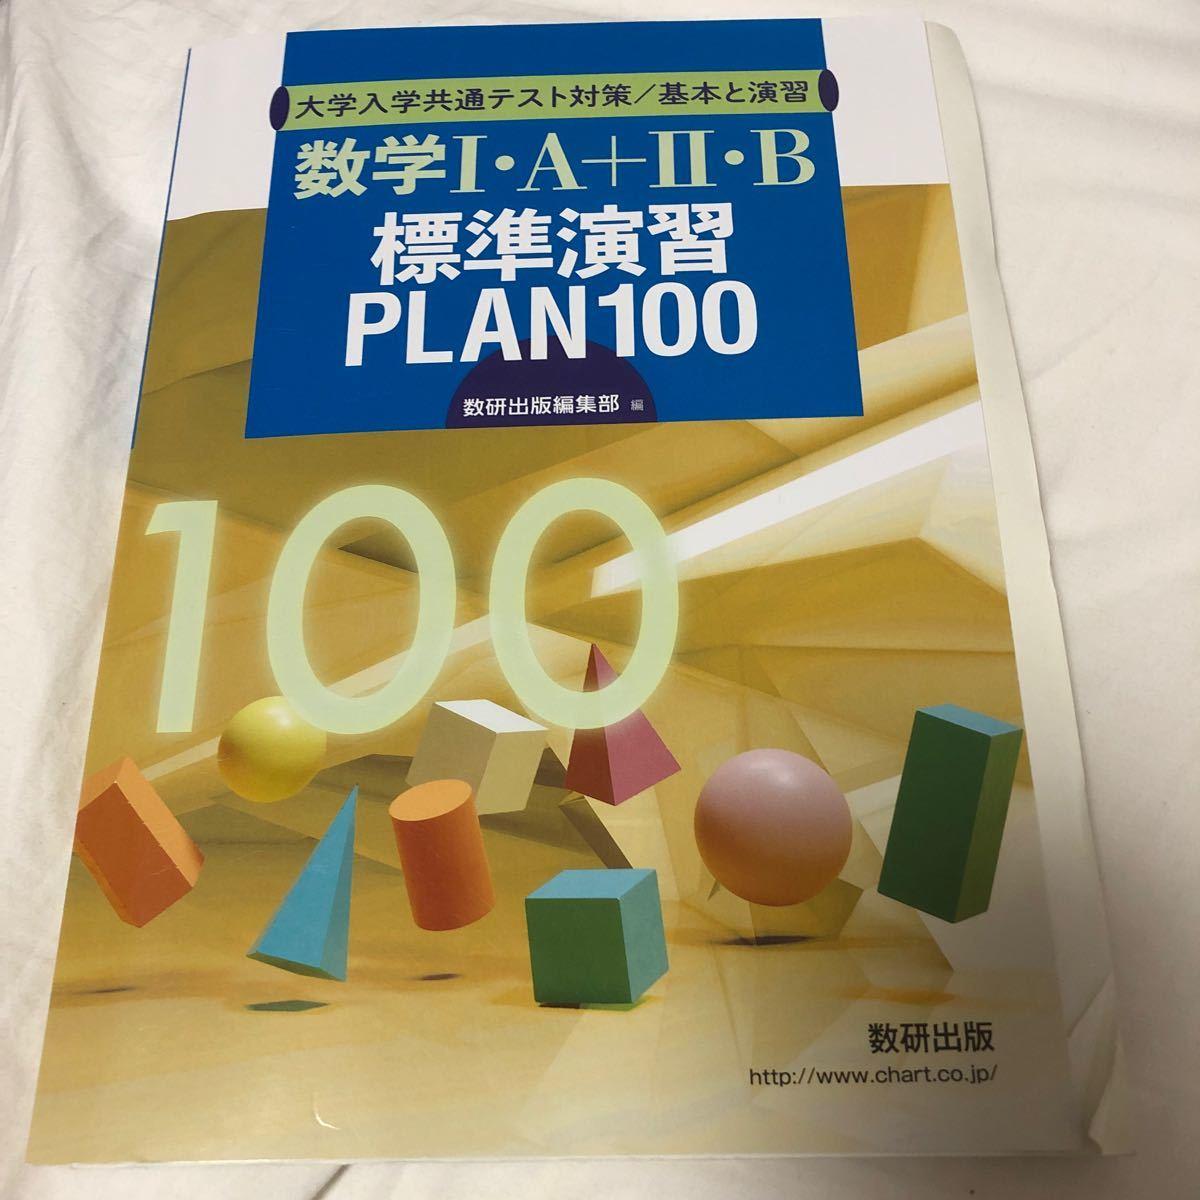 大学入学共通テスト対策 数学 I・A + 2・B 標準演習plan100